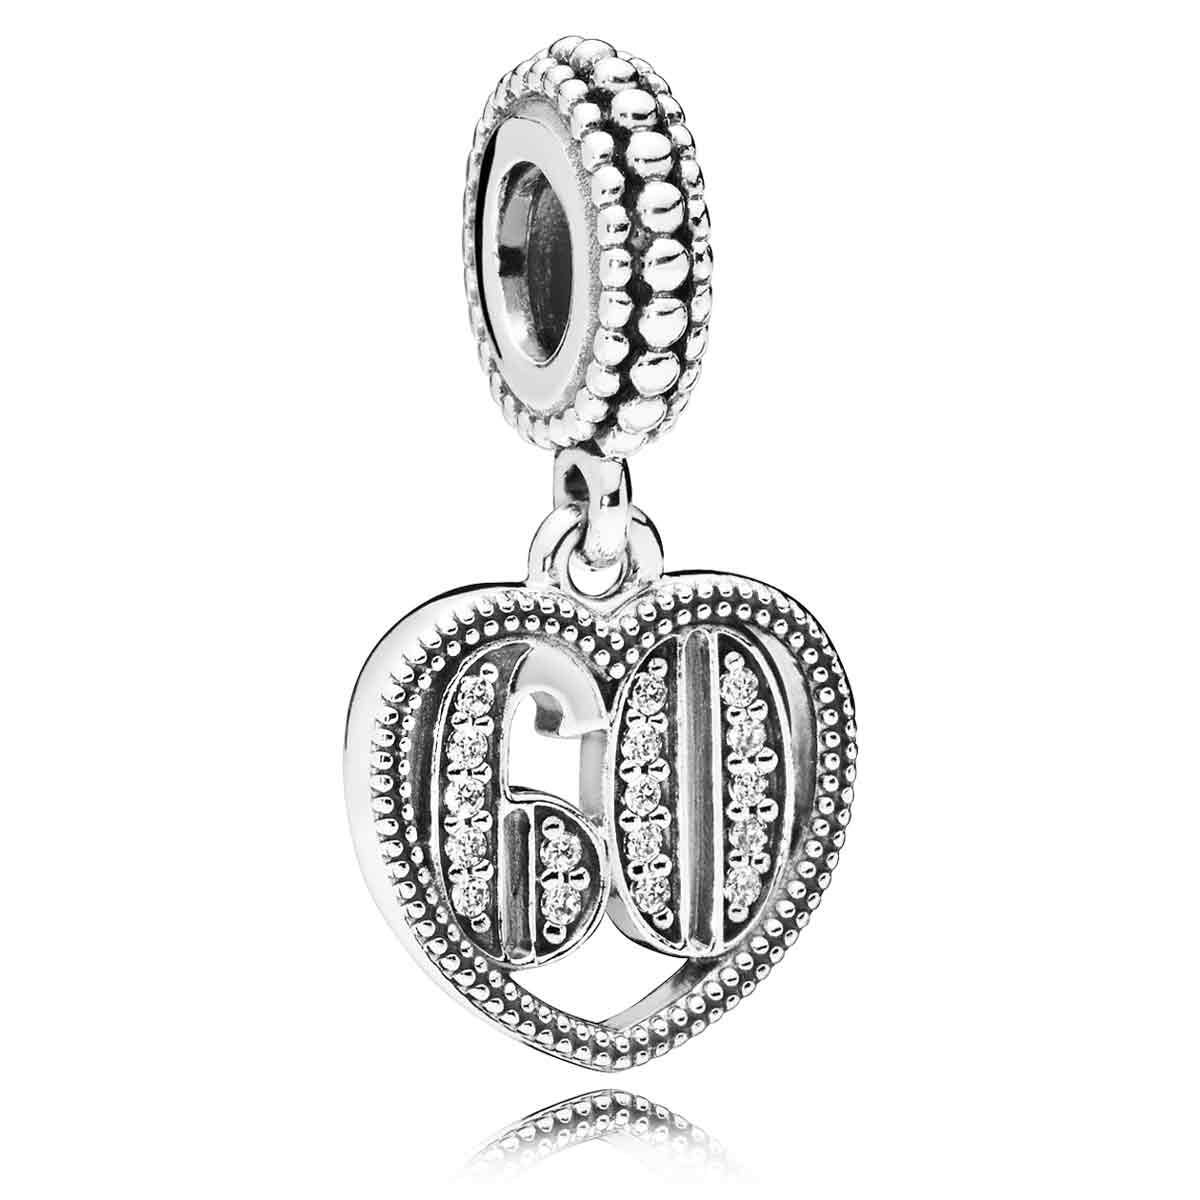 Pandora Women Silver Bead Charm - 797263CZ CLdzz